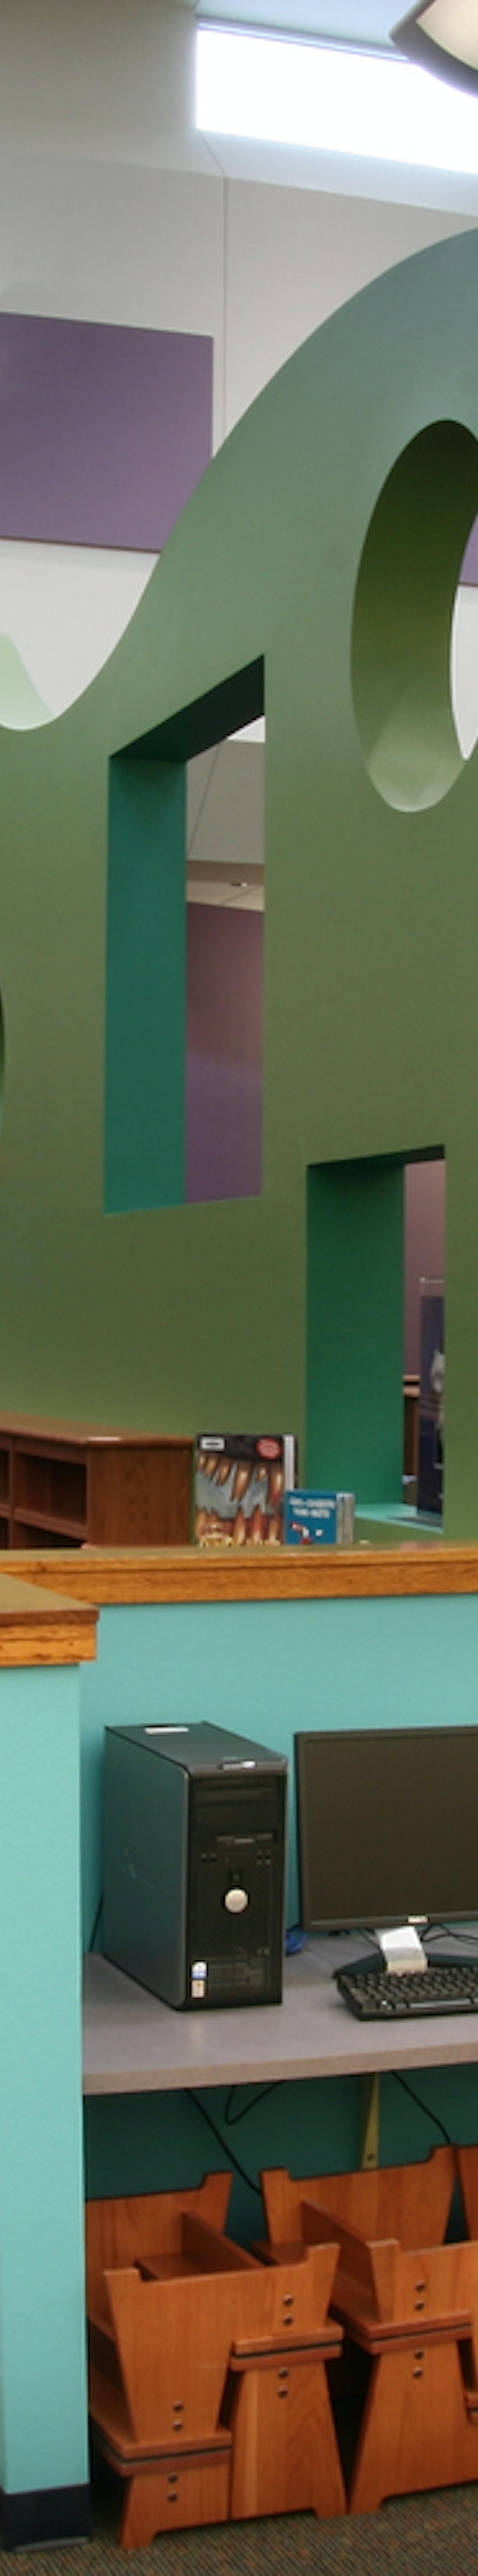 Snyder ISD Elementary School